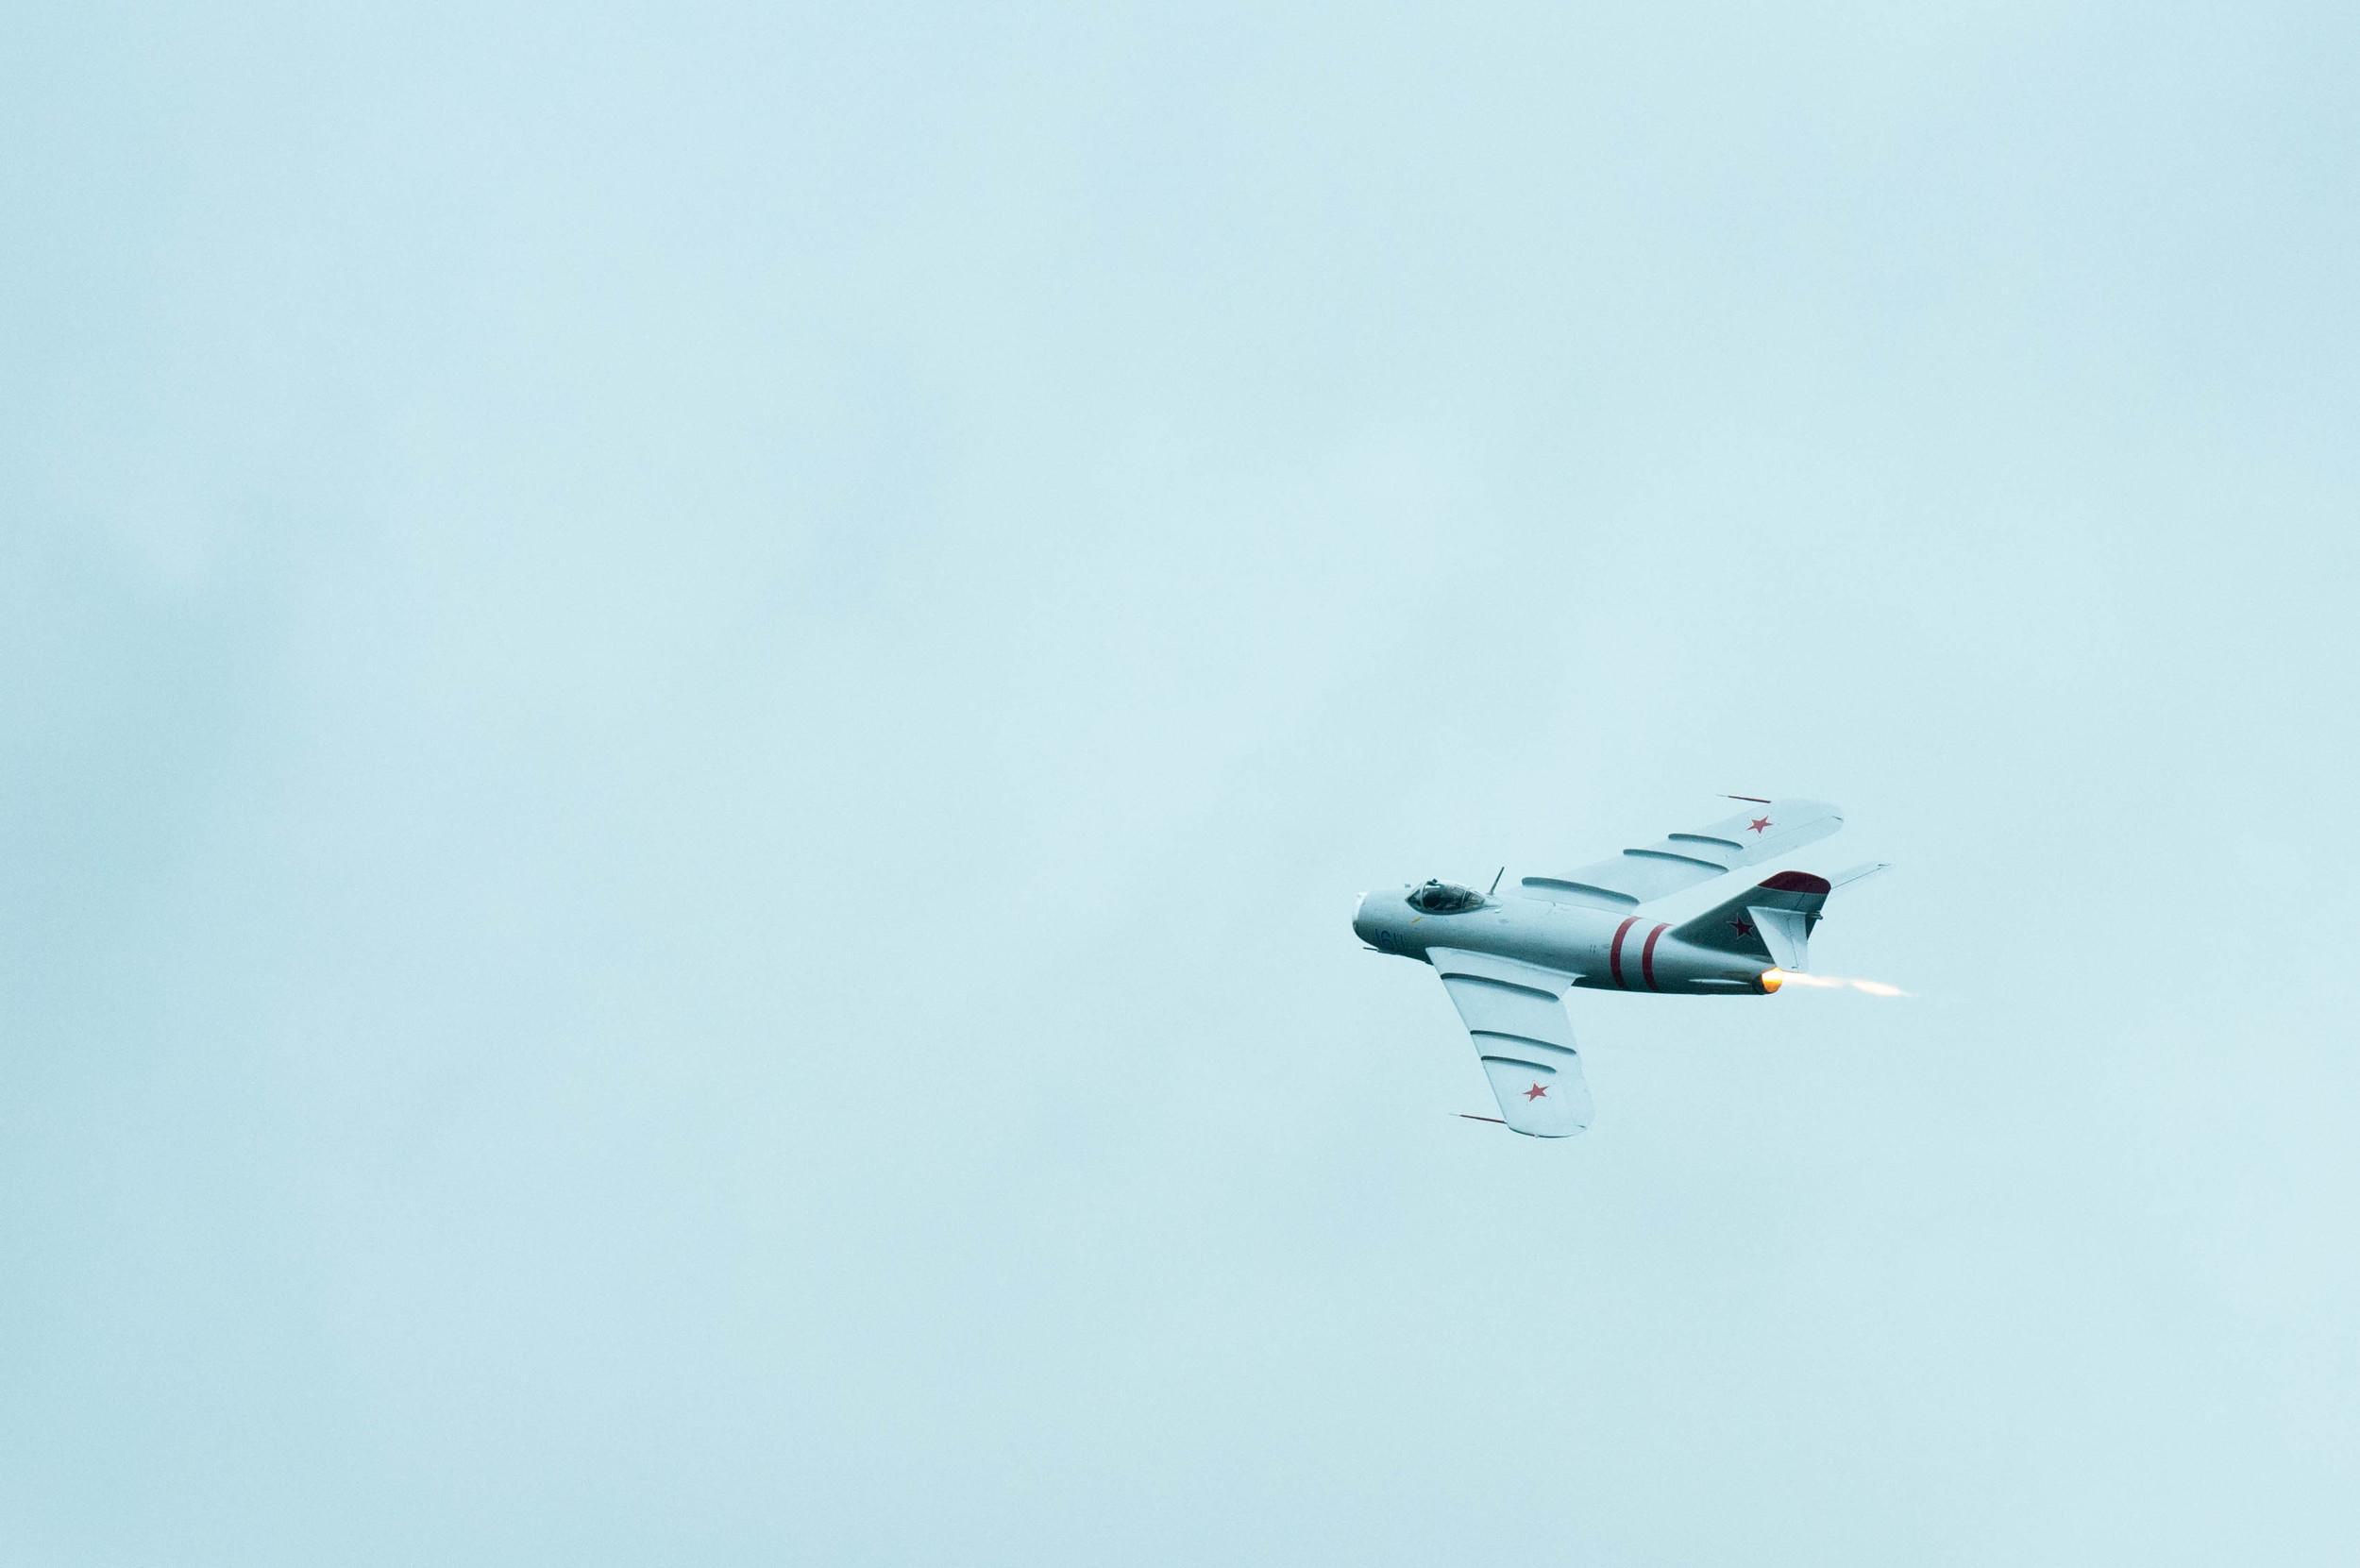 AirFest-27.jpg